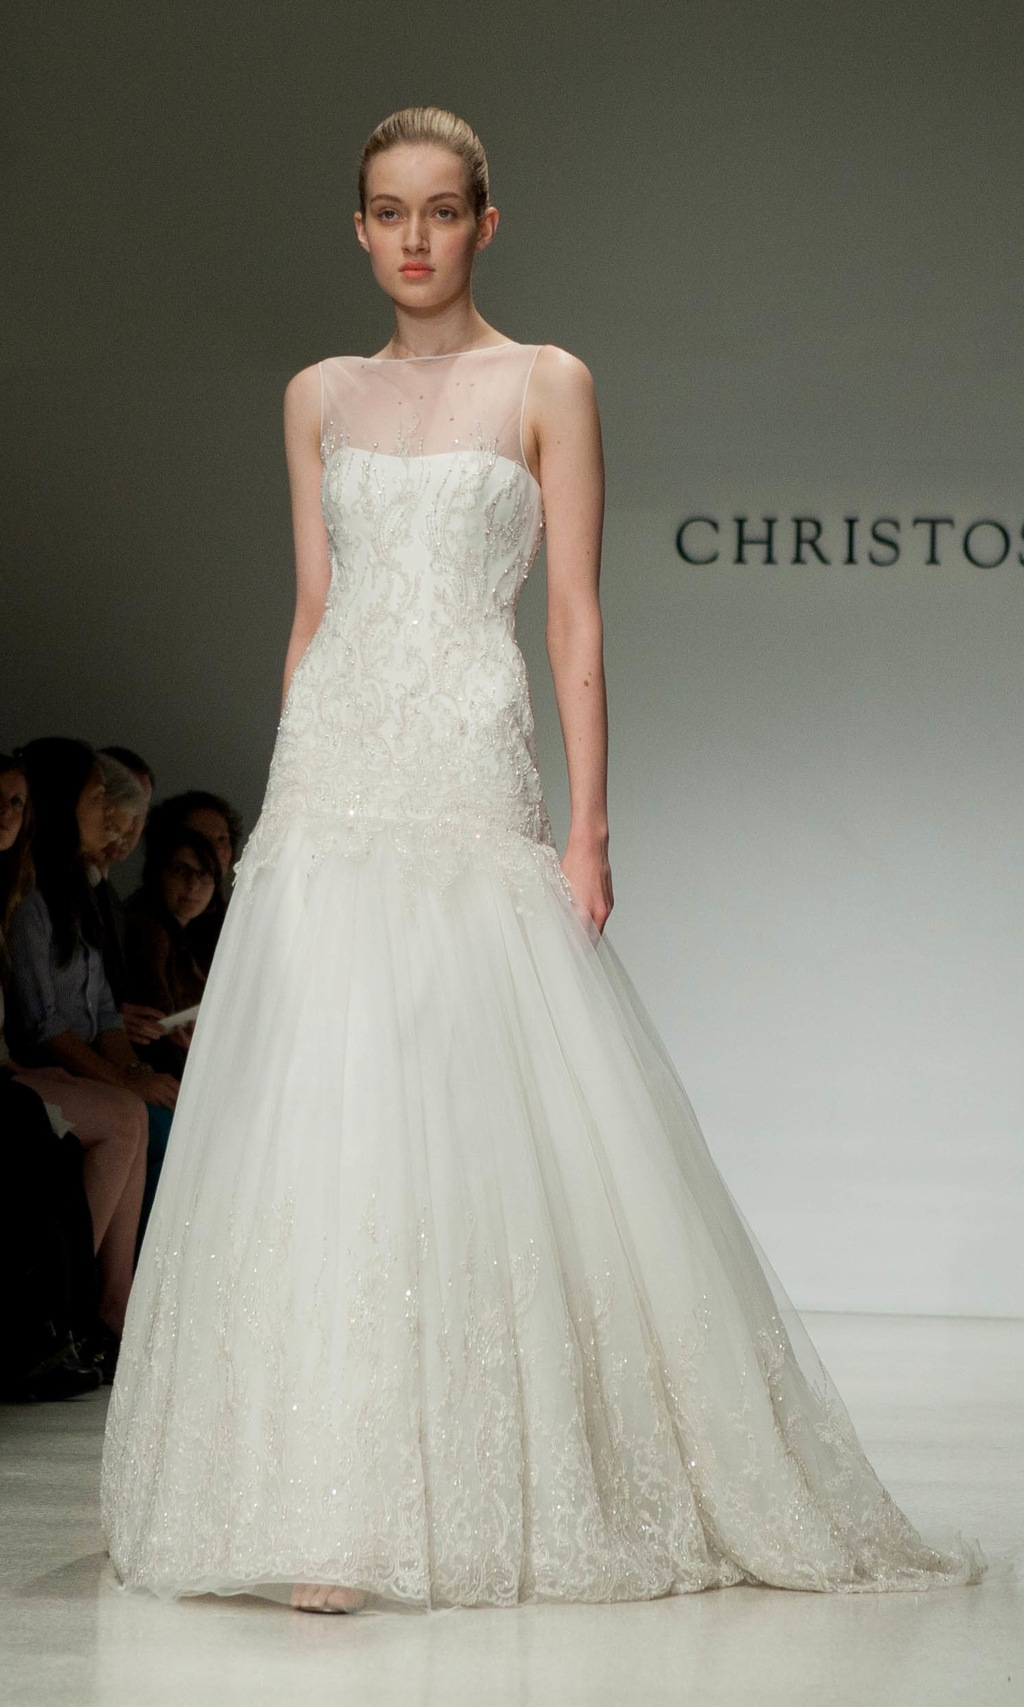 2012_wedding_dress_christos_bridal_gowns_0523.full